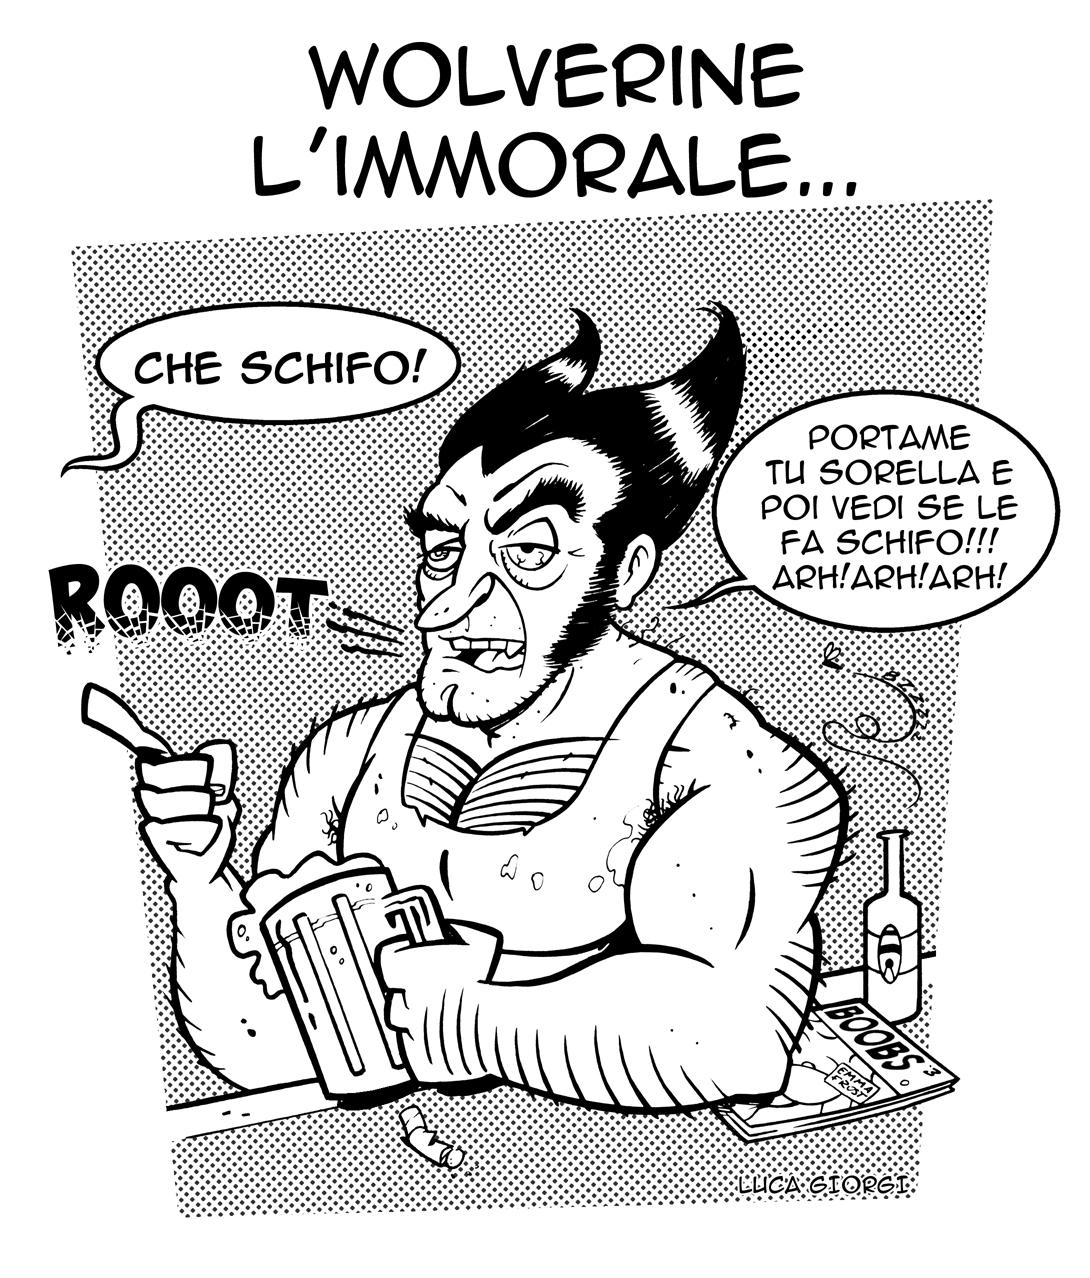 Wolverine l'immorale